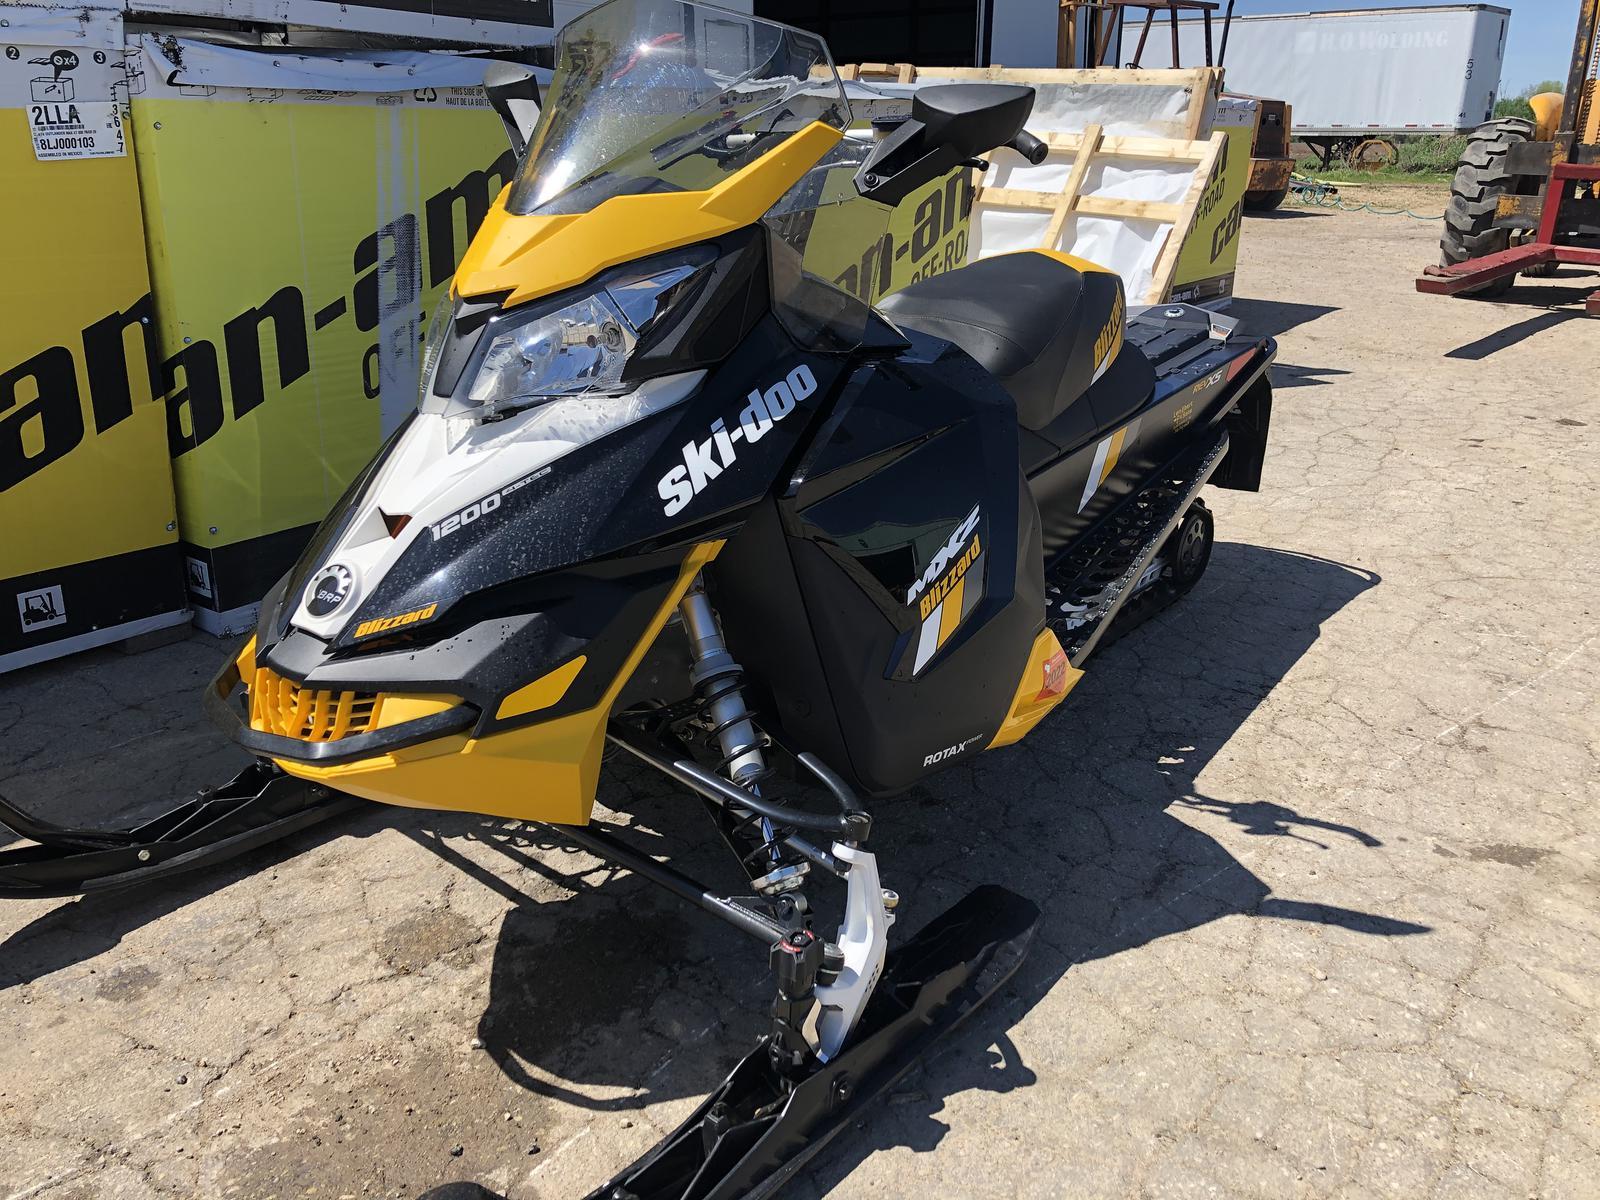 Used Snowmobile Len Ebert Sons Clintonville Wi 715 752 4428